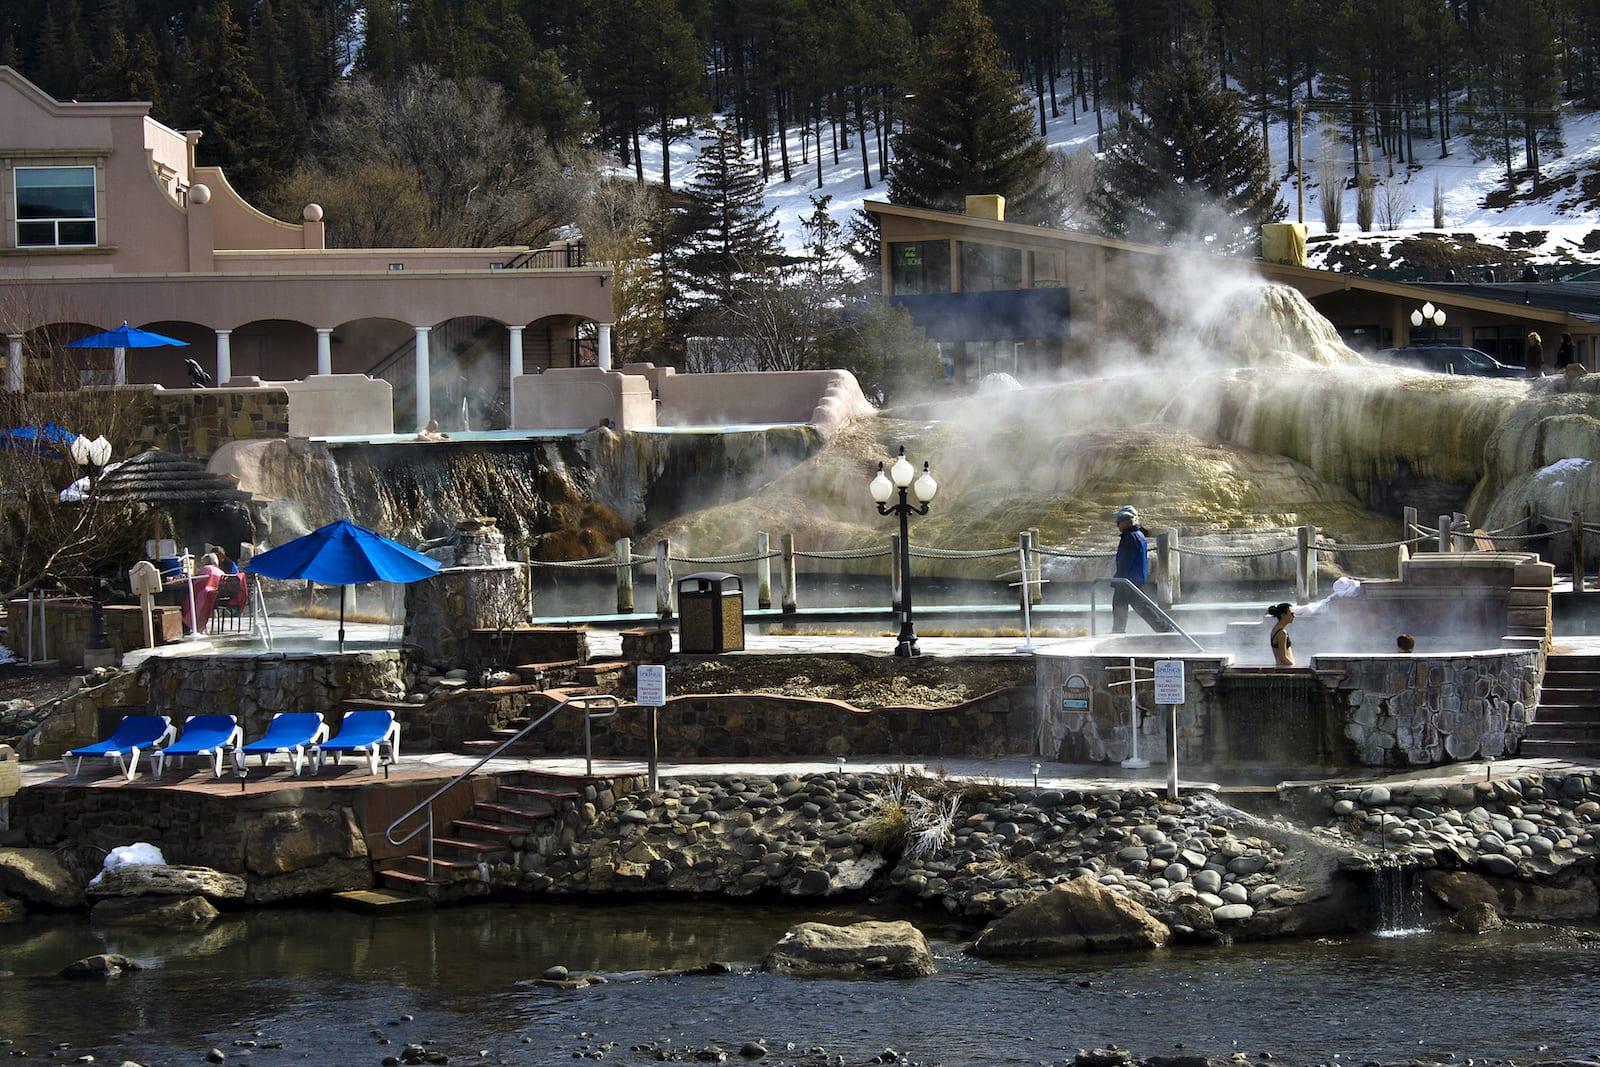 The Springs Resort Hot Spring Pools Pagosa Springs CO